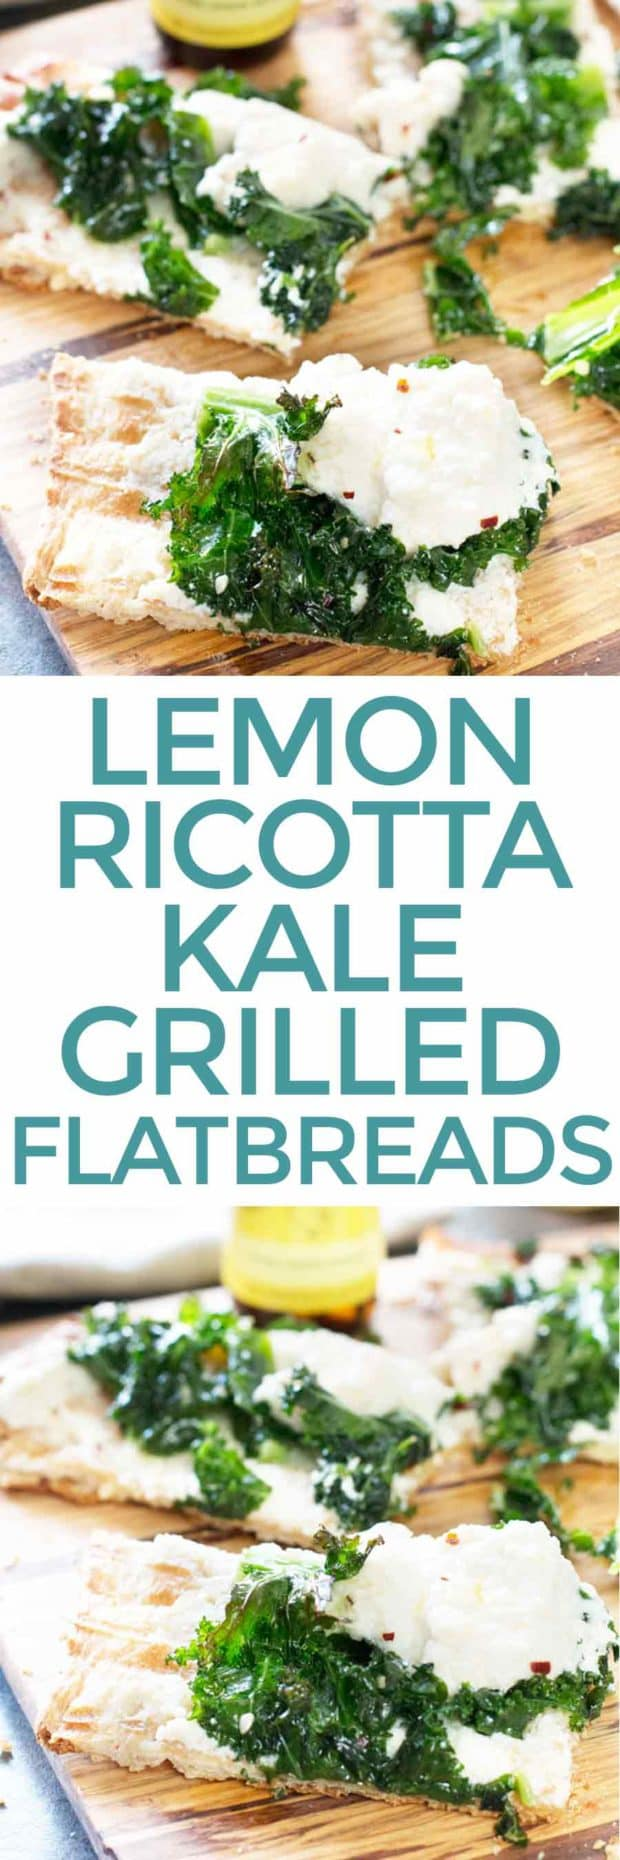 Grilled Lemon Ricotta Kale Flatbreads   cakenknife.com #grilling #BBQ #pizza